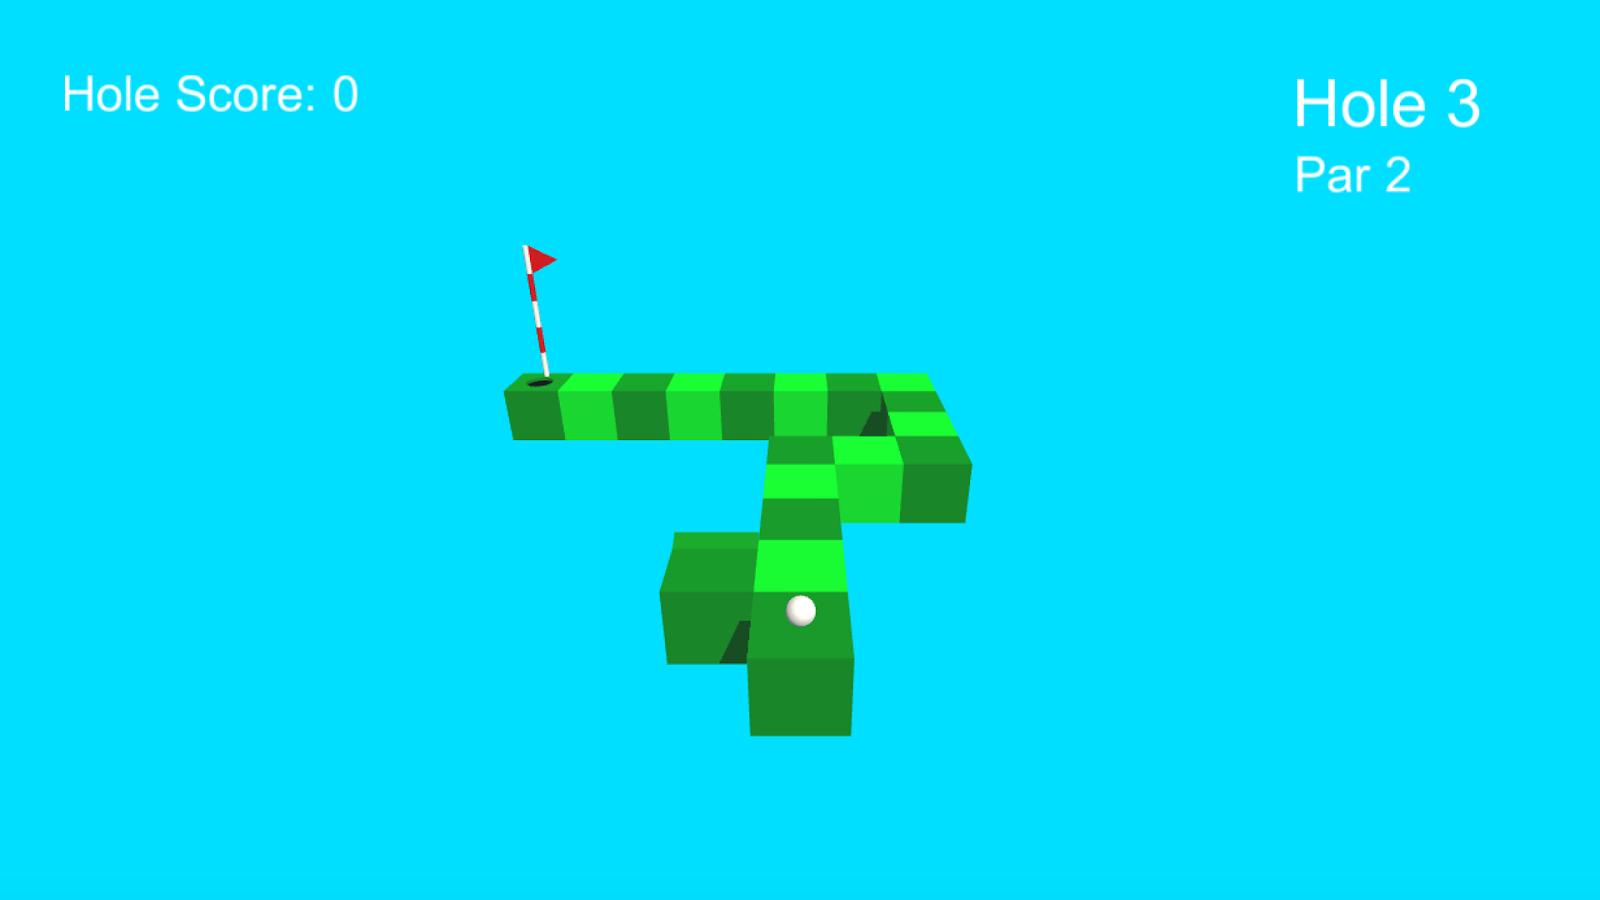 TipTap-Golf 12